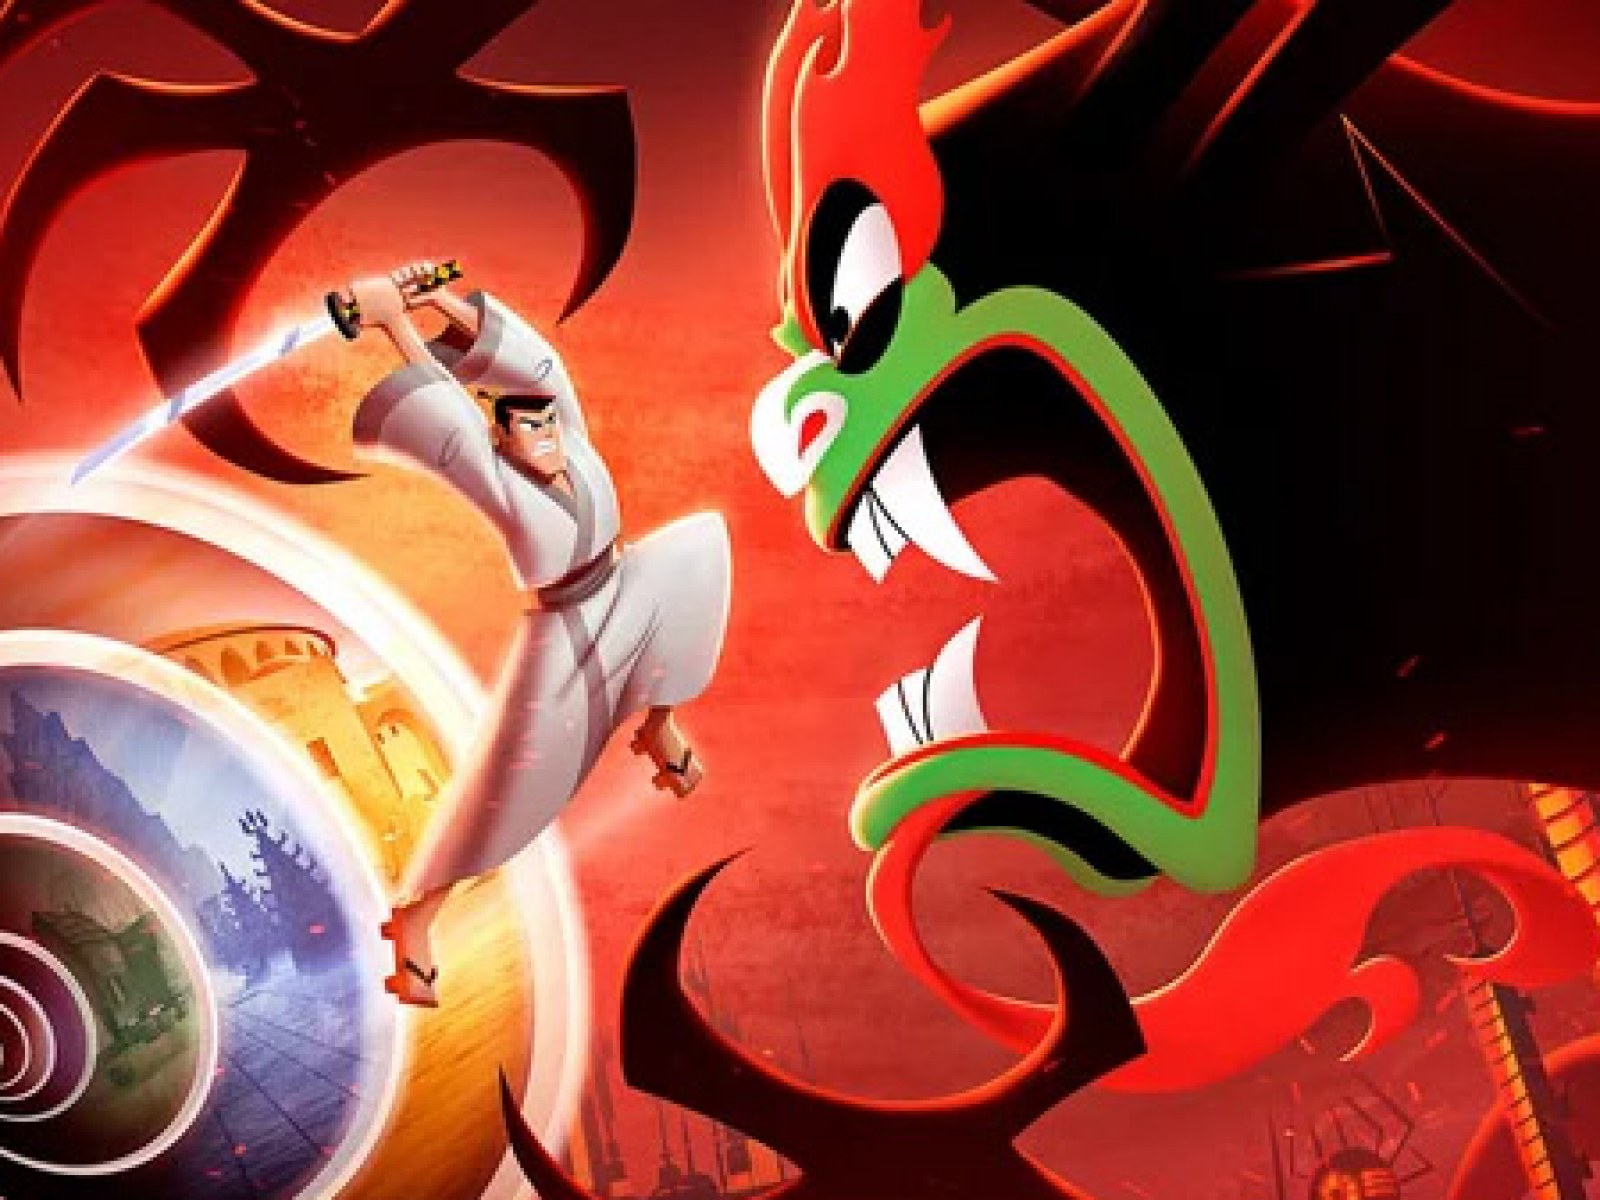 Samurai Jack Returns In Battle Through Time Video Game